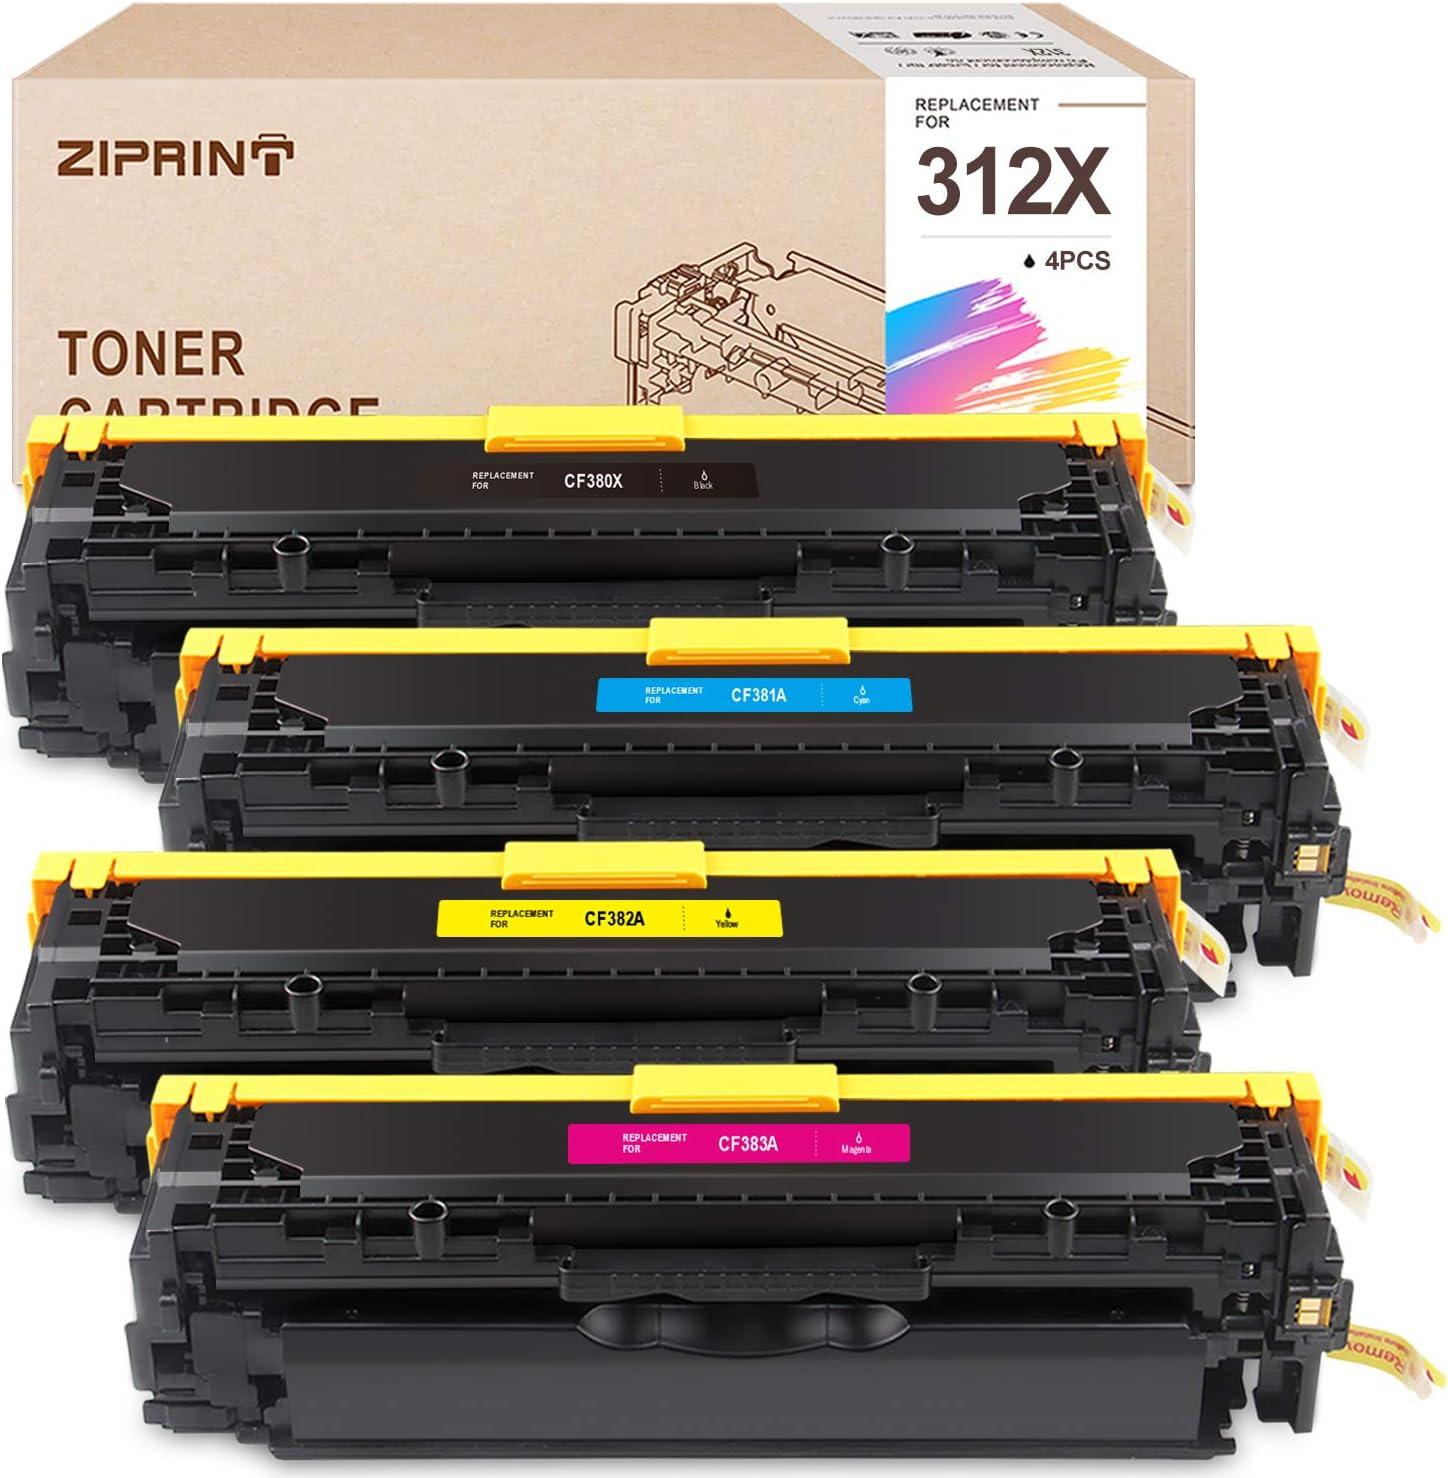 ZIPRINT Remanufactured Toner Cartridge Replacement for HP 312A 312X CF380X CF381A CF382A CF383A Toner use with HP Color Laser Jet Pro MFP M476nw M476dn M476dw Printers (4-Pack)